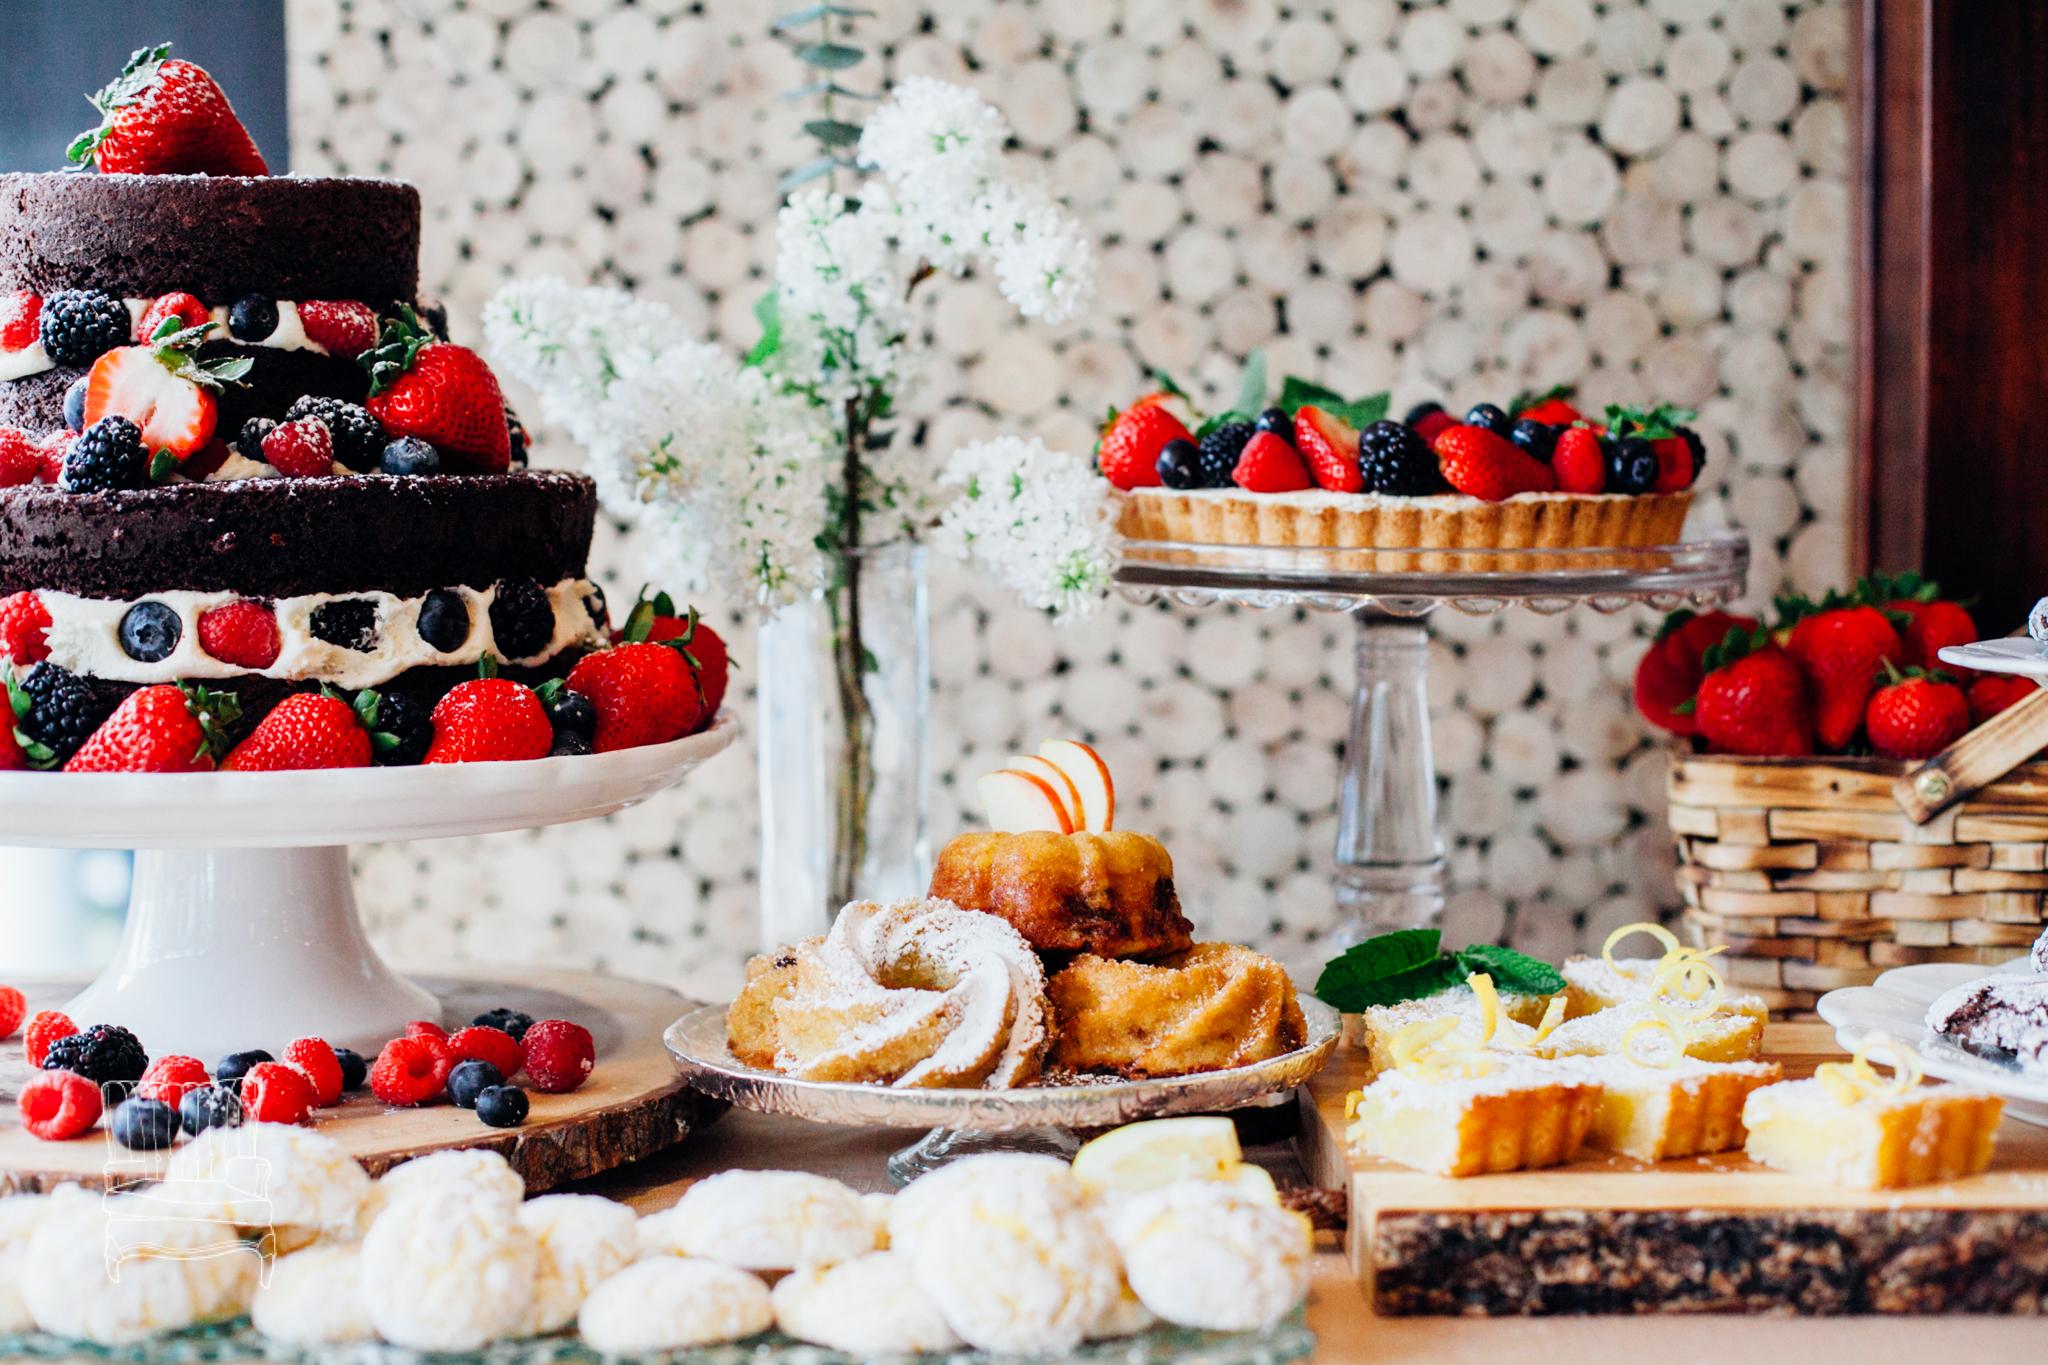 bellingham-food-dessert-marketing-photographer-photo -1.jpg